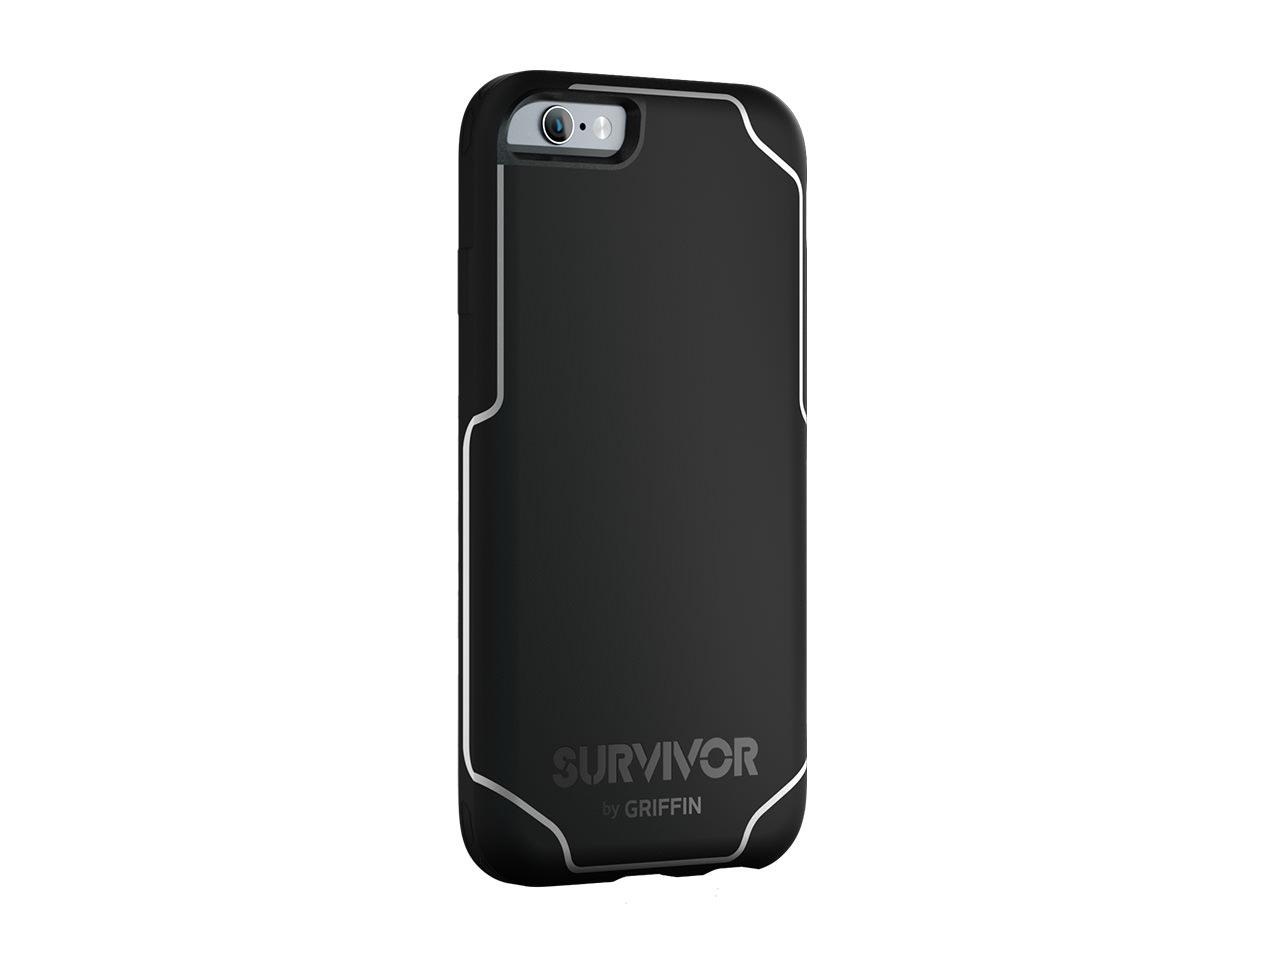 Black/White Survivor Journey for iPhone 6/6s Protective Case - 6ft drop Protection